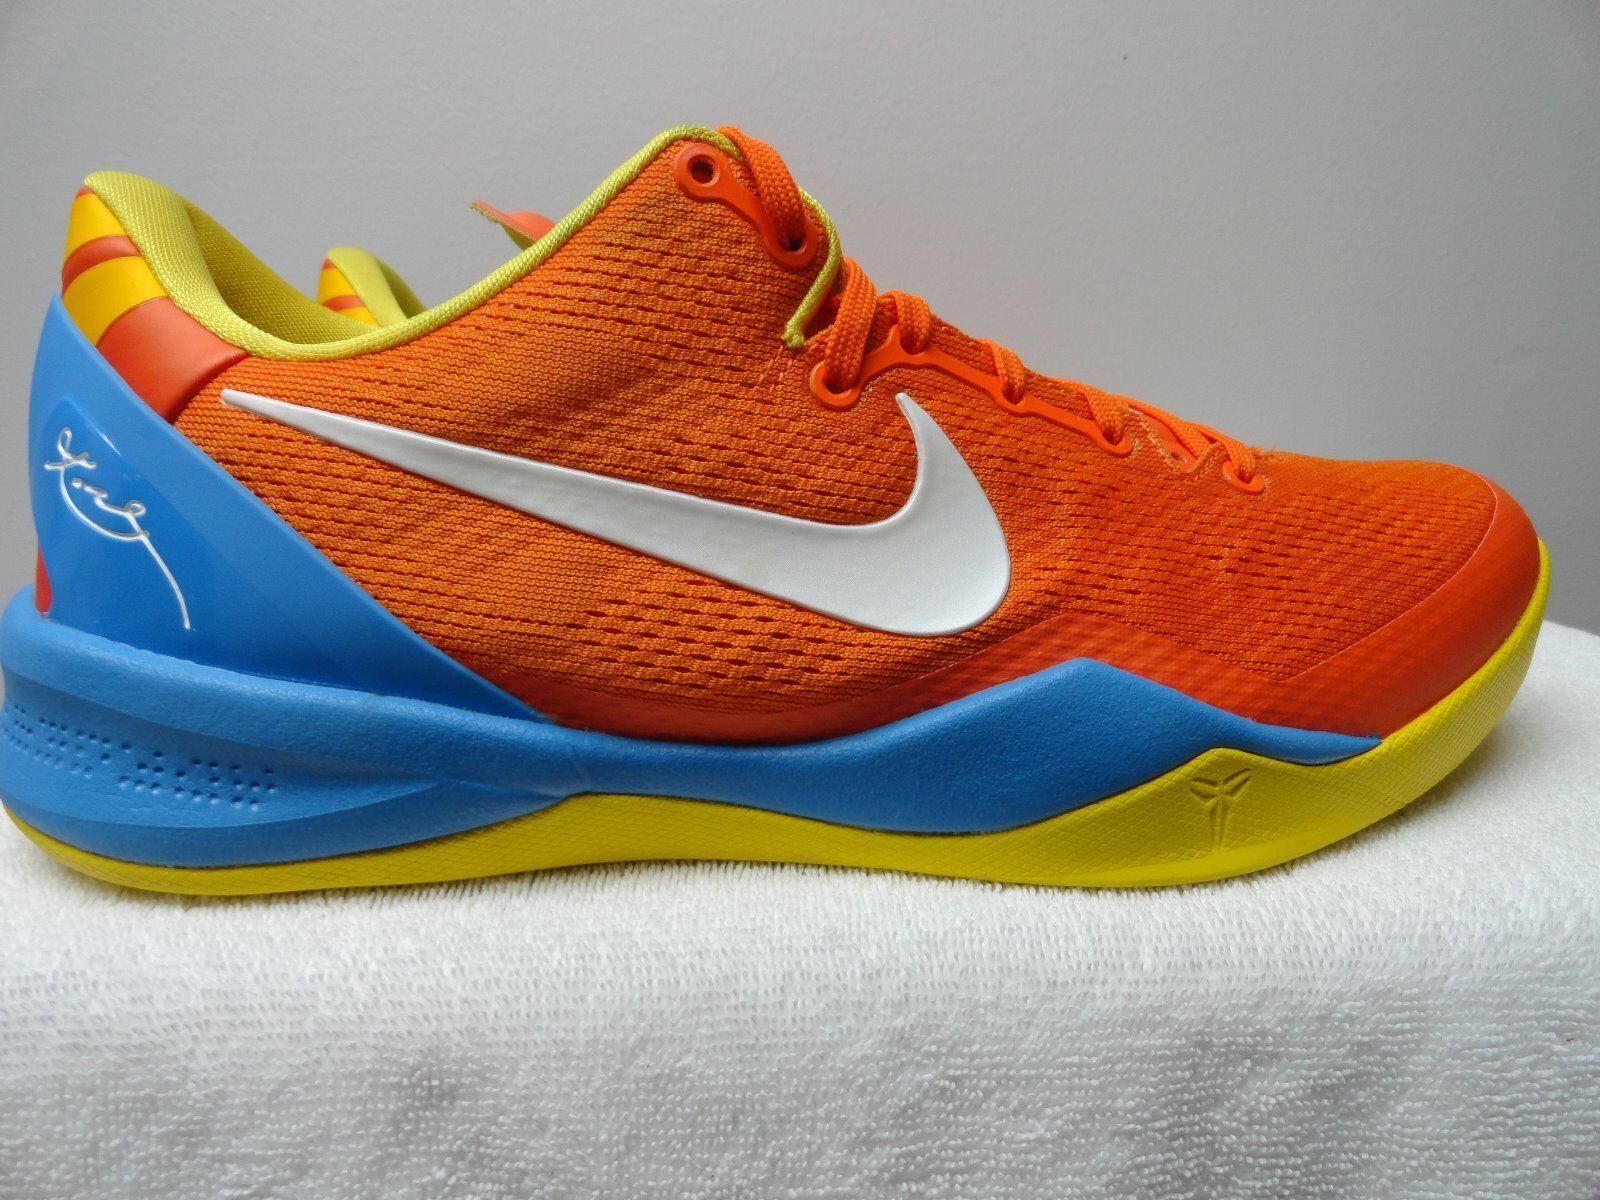 Nike kobe 8 pairs